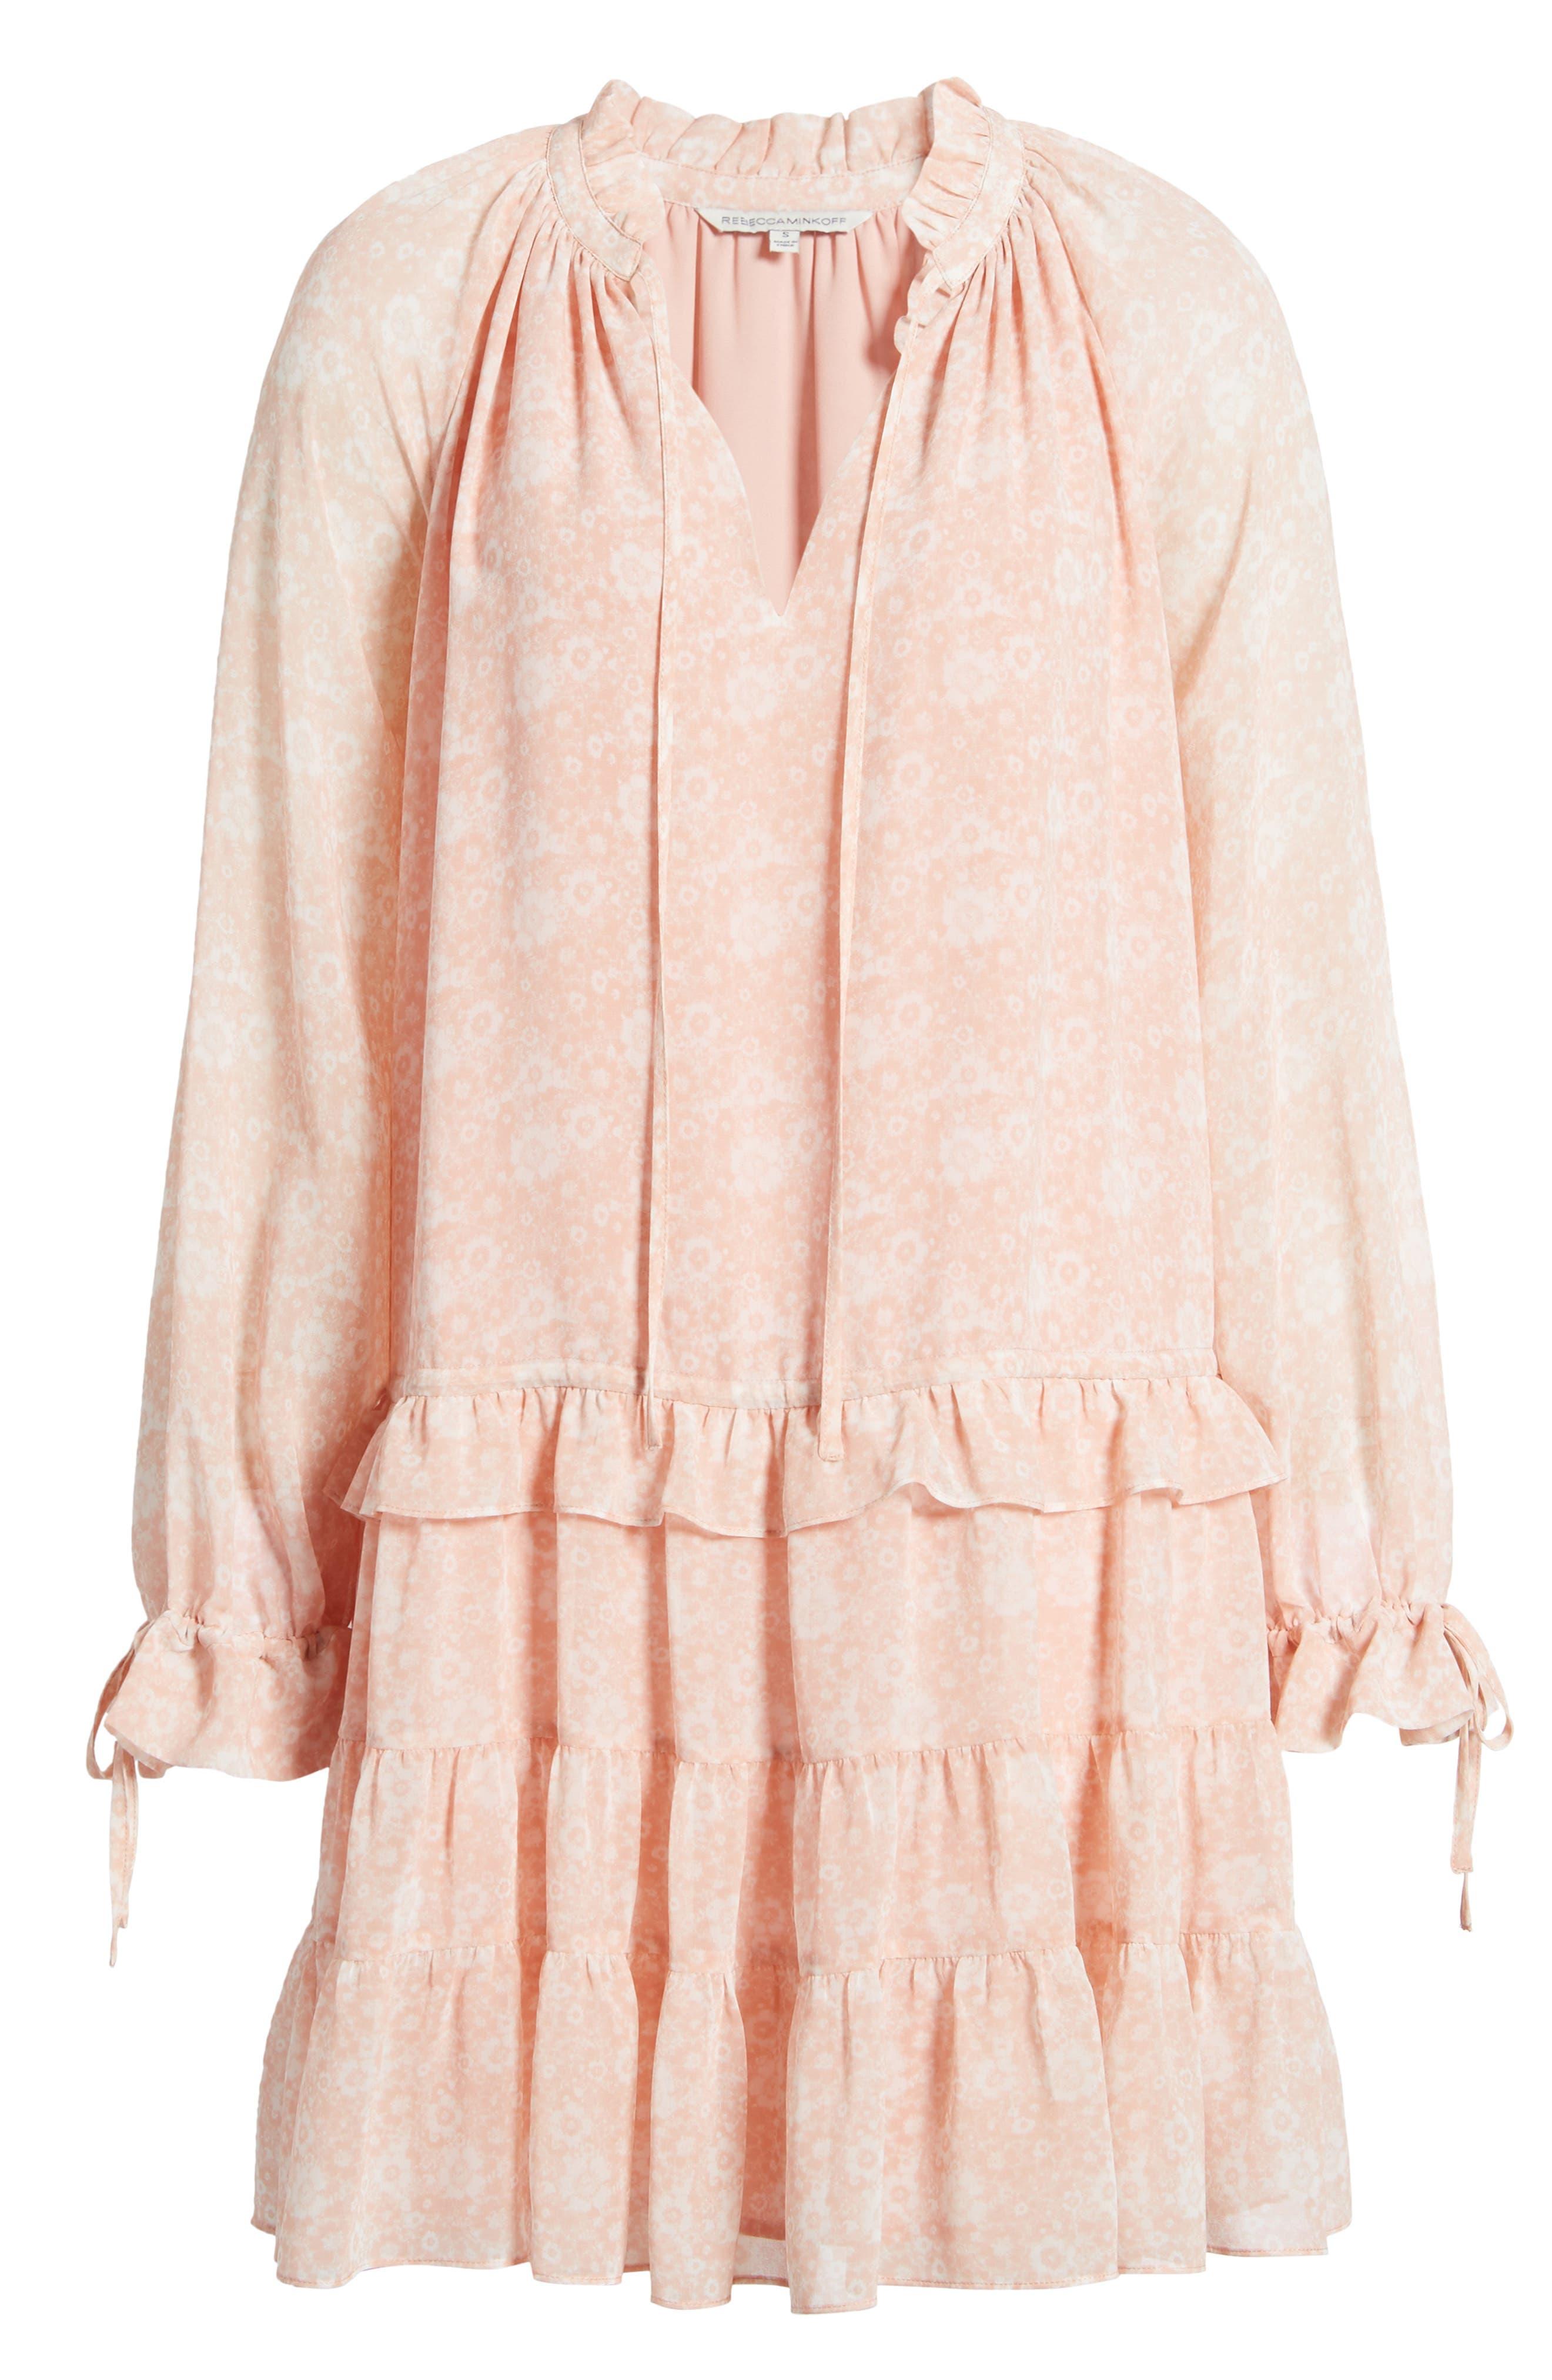 Dylan Drop Waist Dress,                             Alternate thumbnail 6, color,